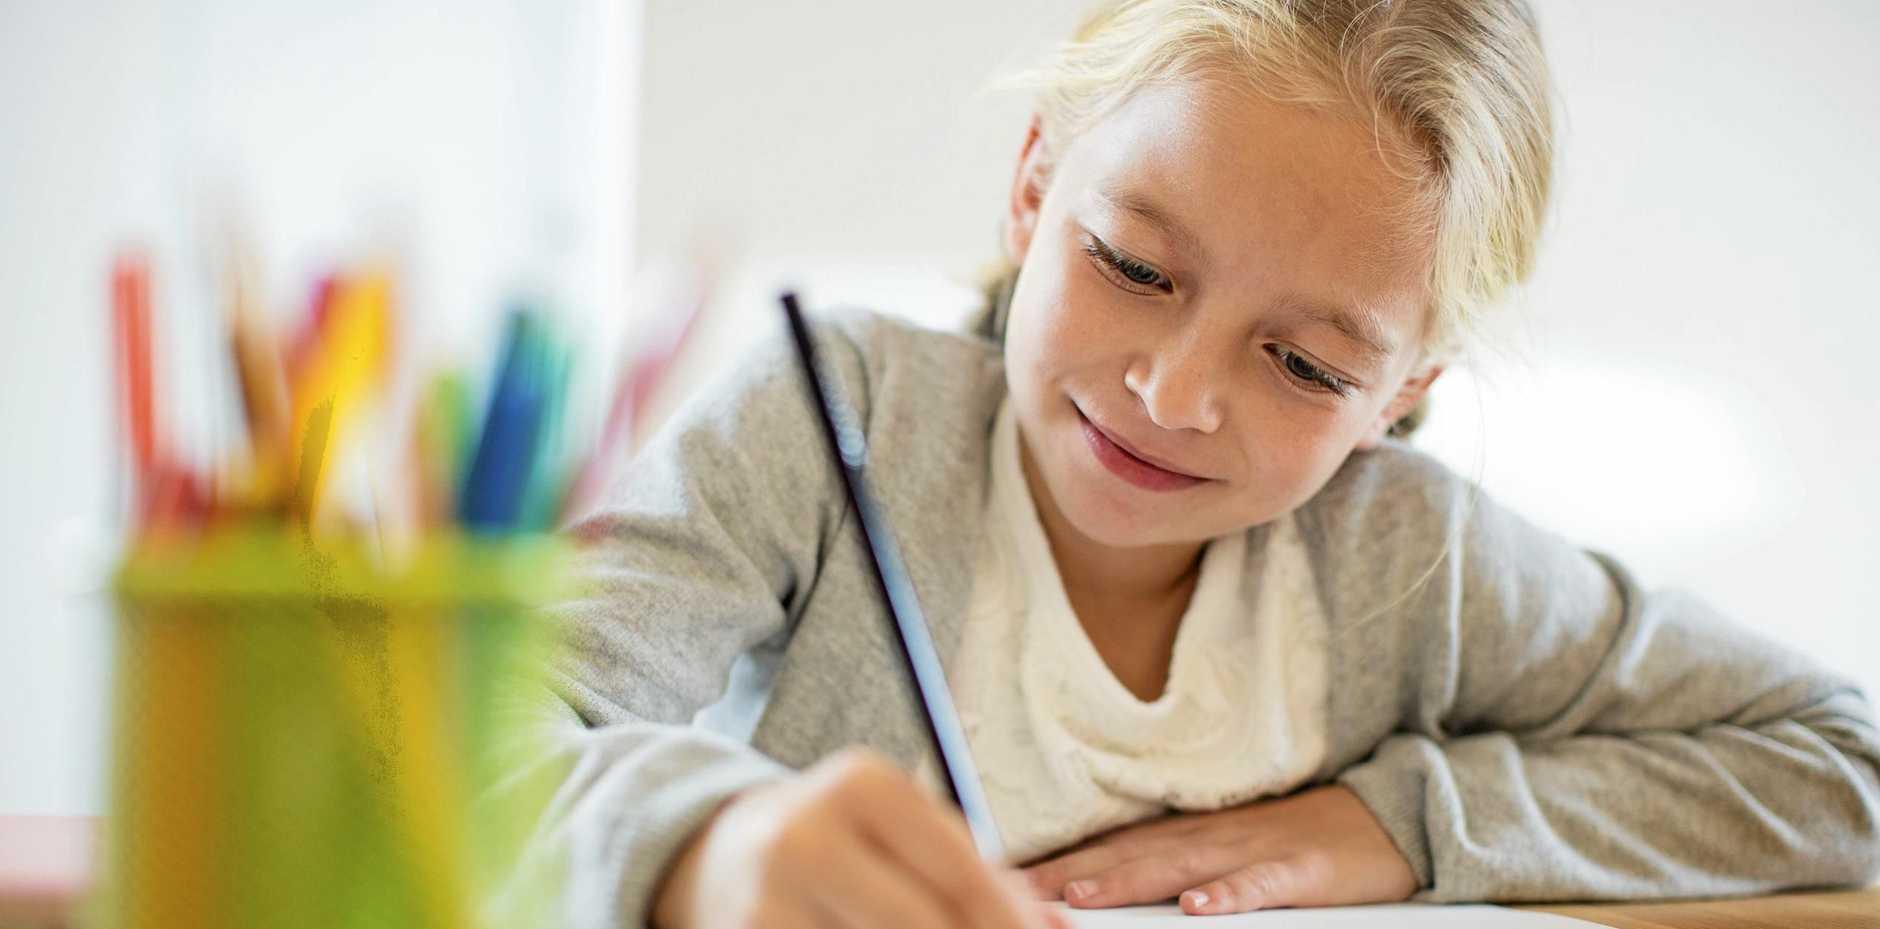 DITCH HOMEWORK: Finnish students don't do homework so why should Aussie kids?